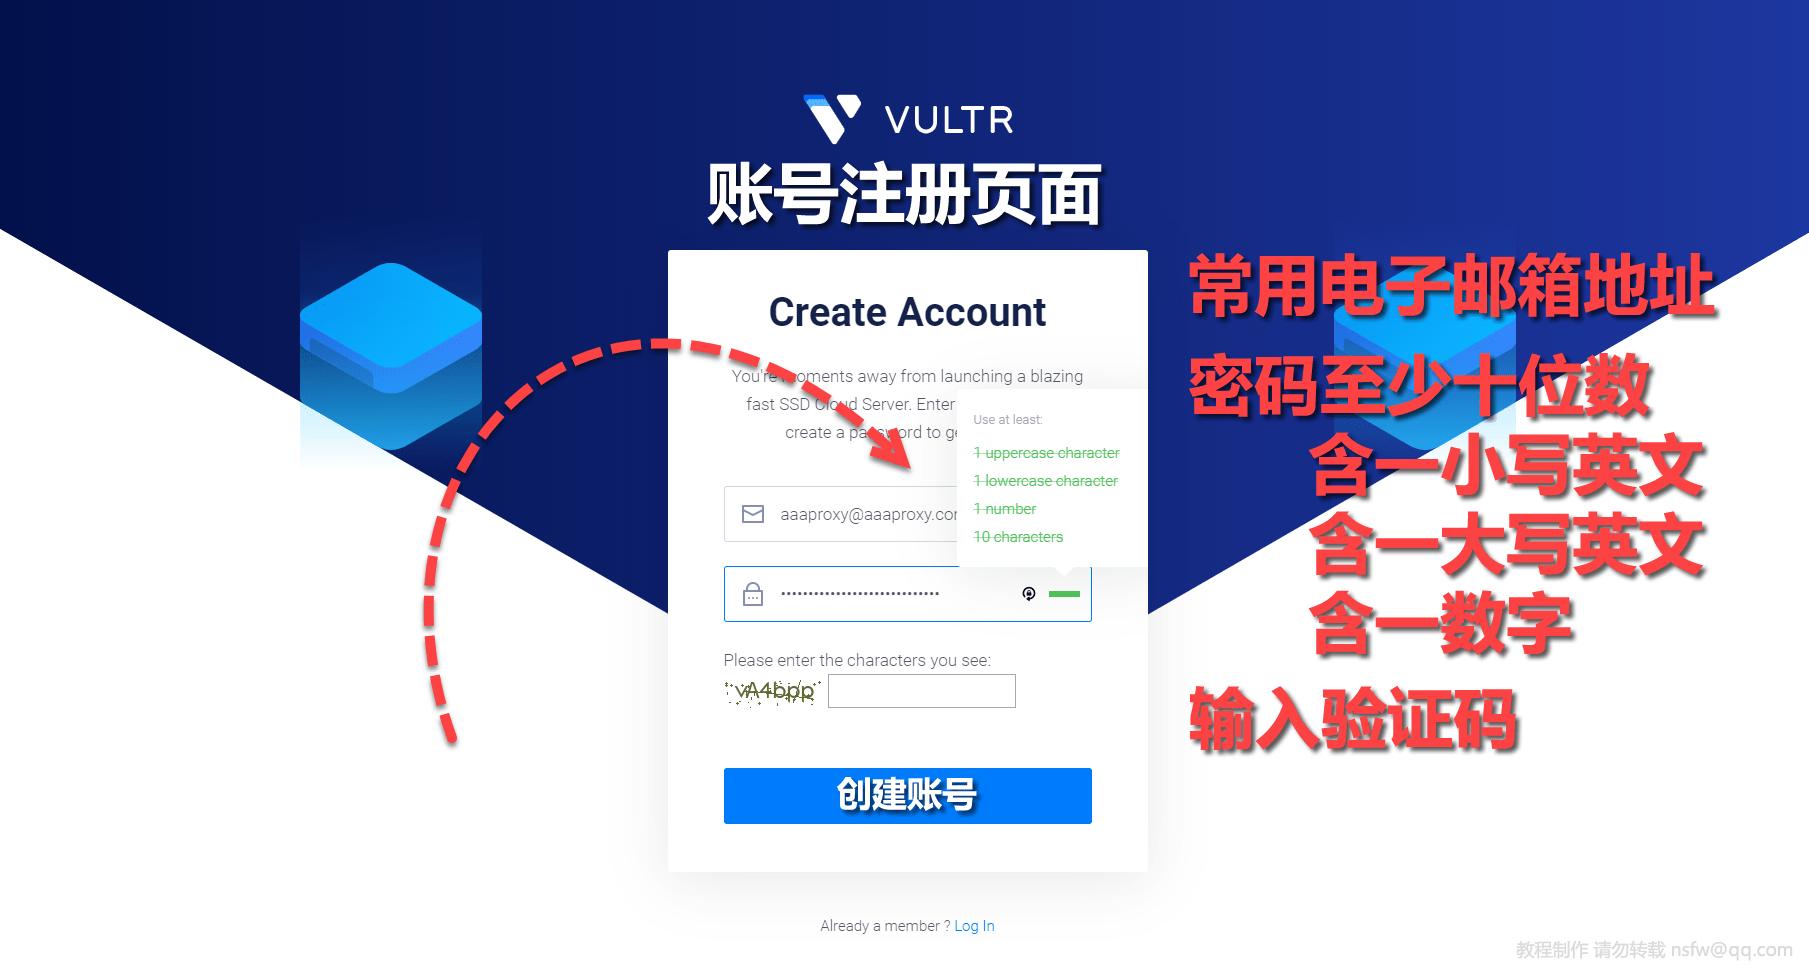 Vultr新手教程 - 如何注册Vultr账户 并 获取最新Vultr优惠码